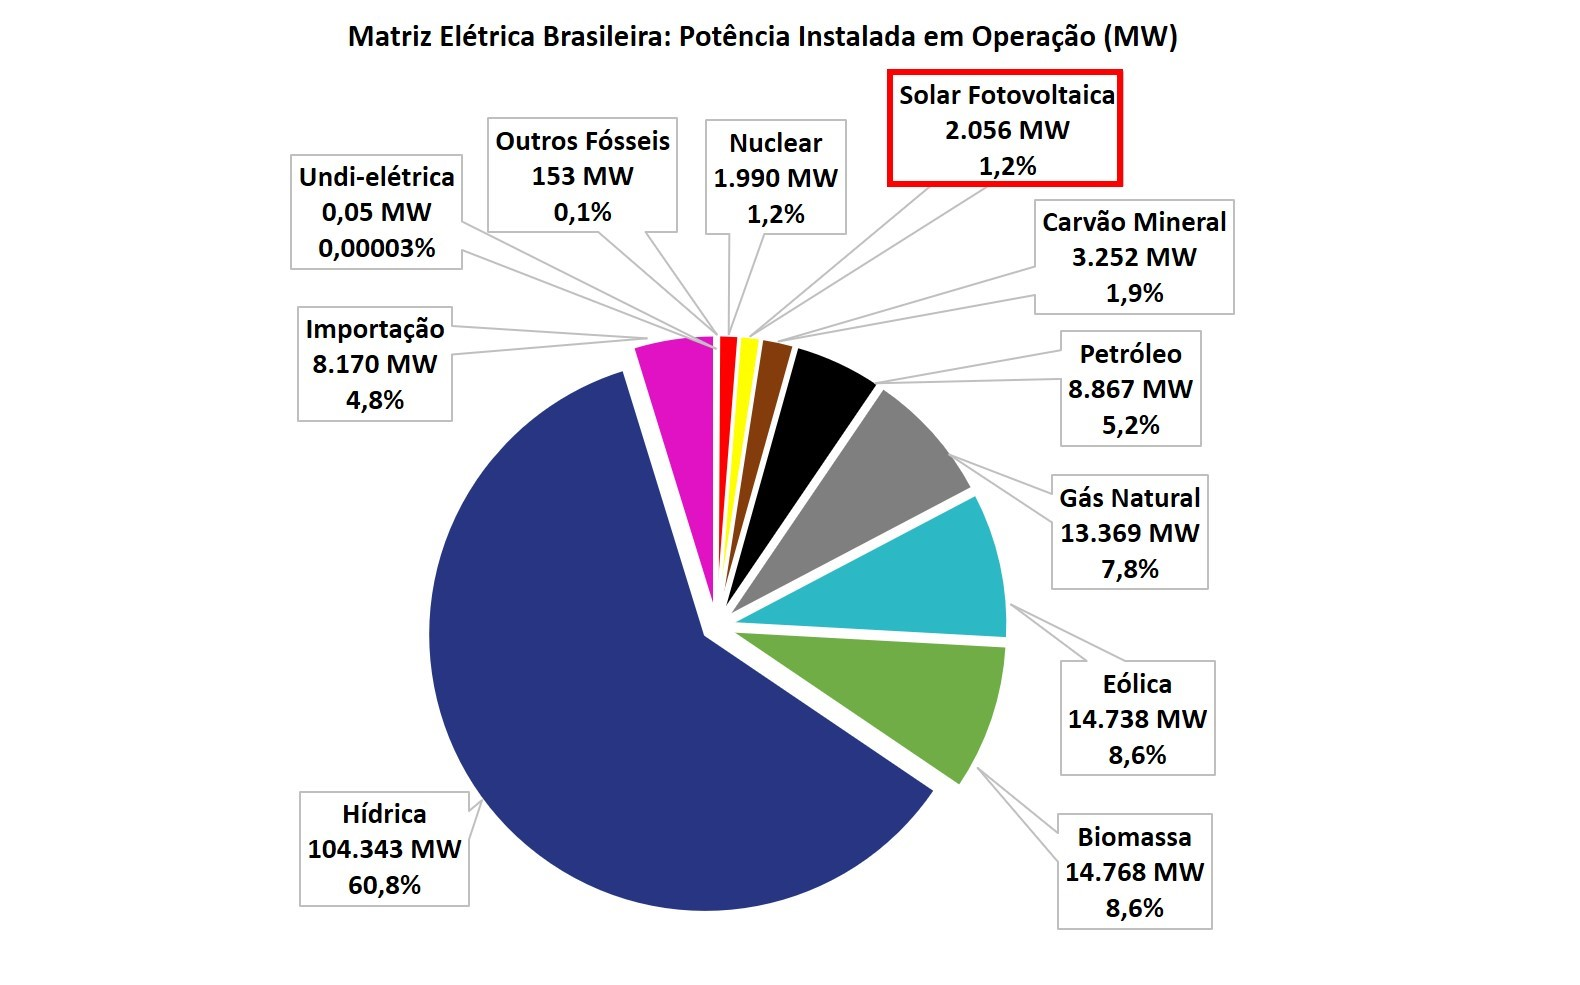 energia renovável no brasil _ matriz elétrica brasileira